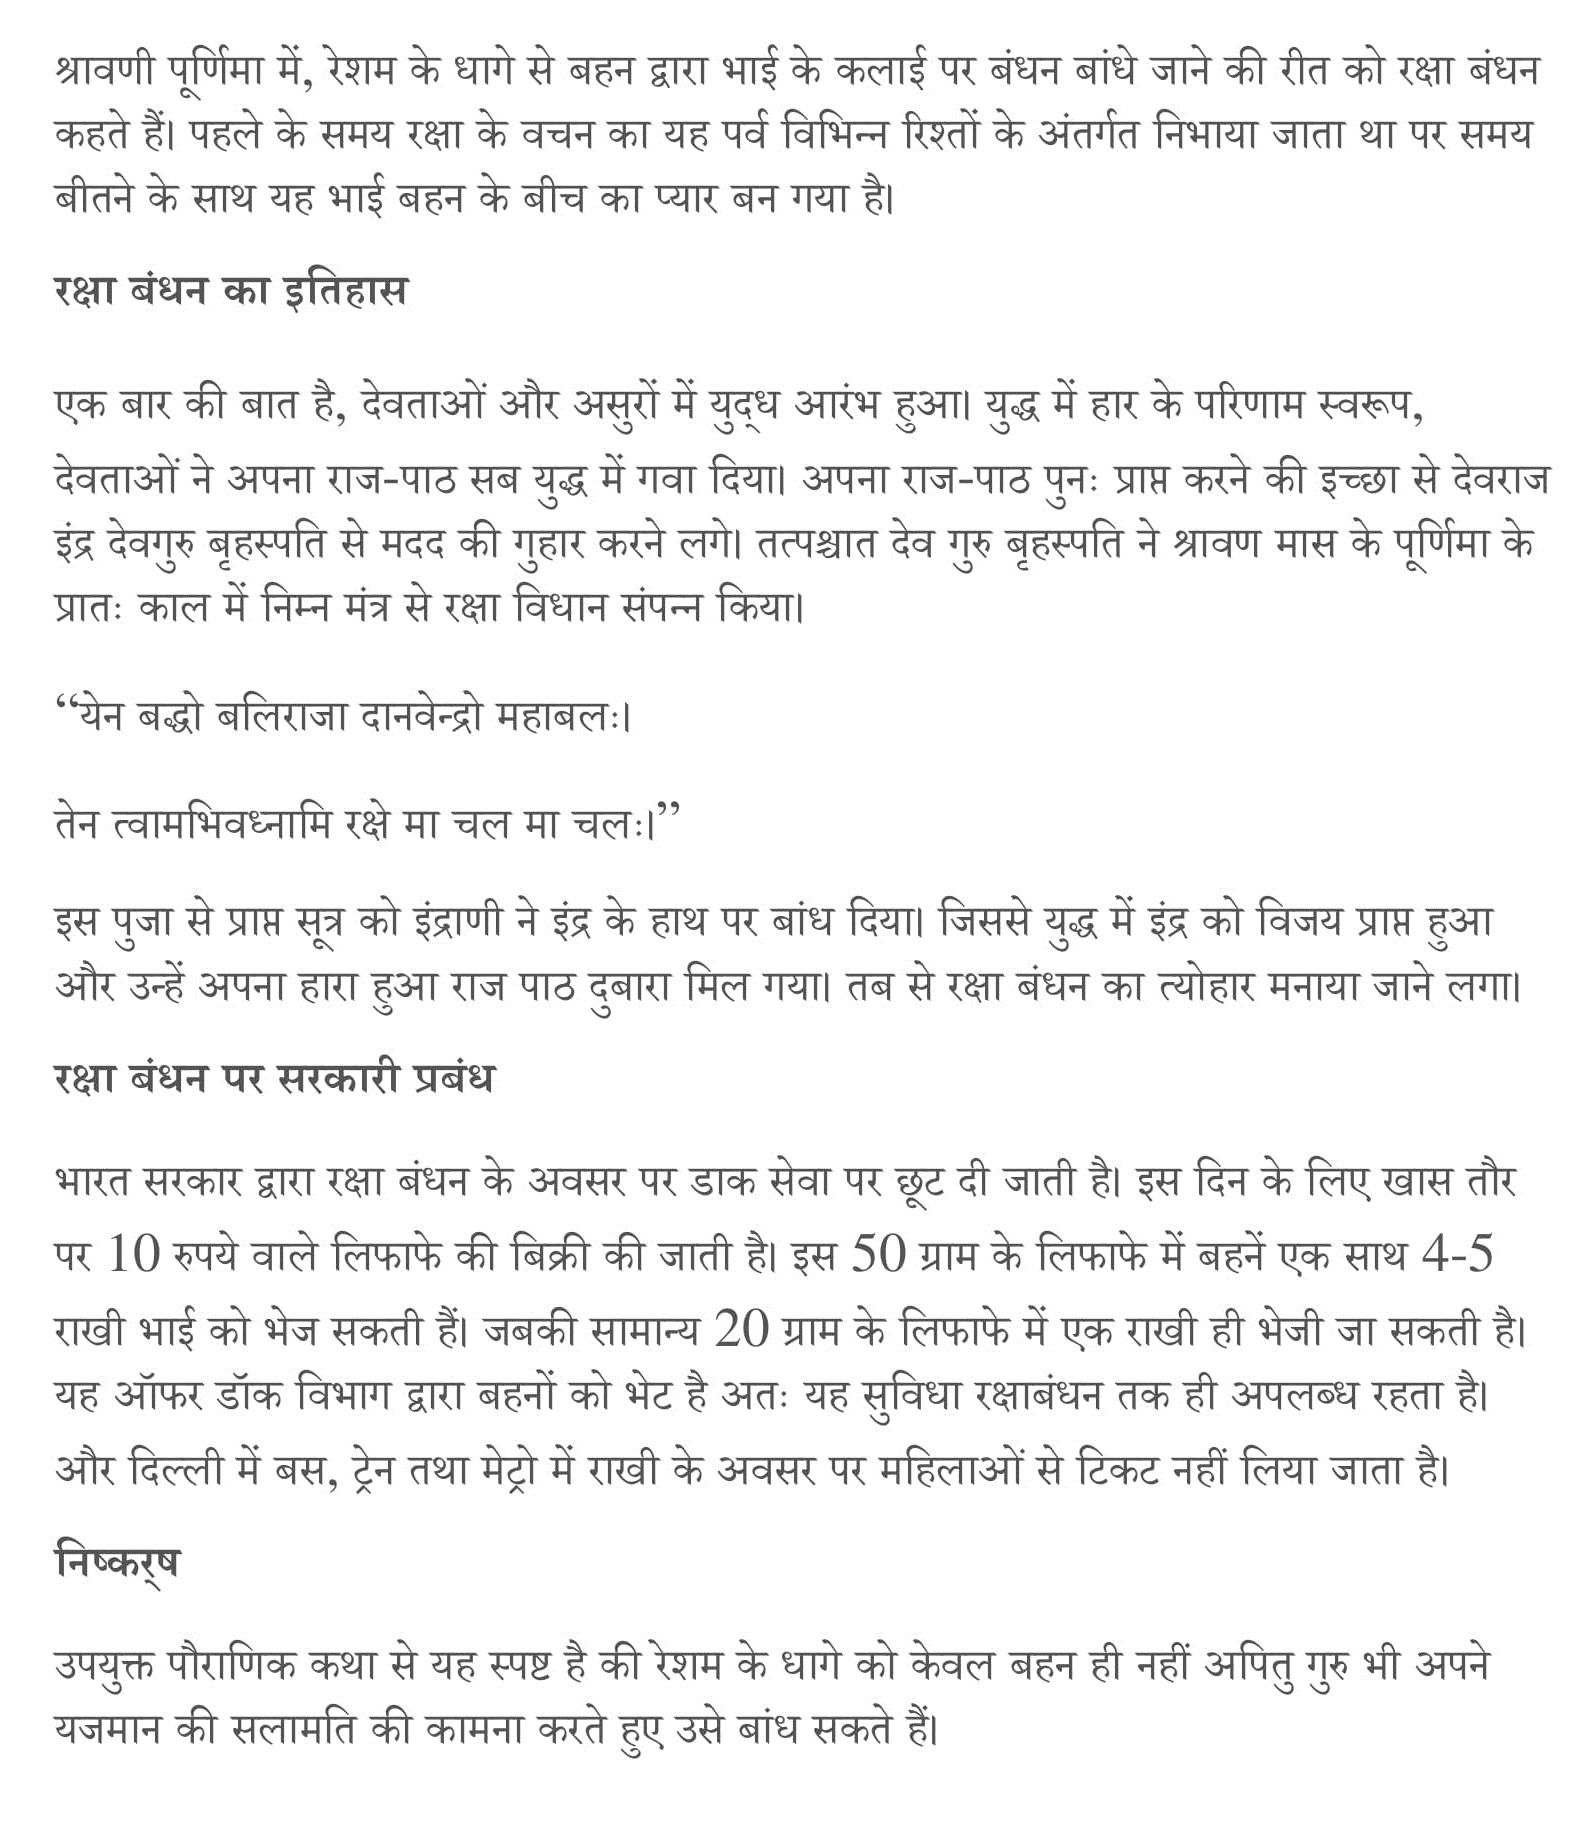 Raksha Bandhan Essay in Hindi 300 words